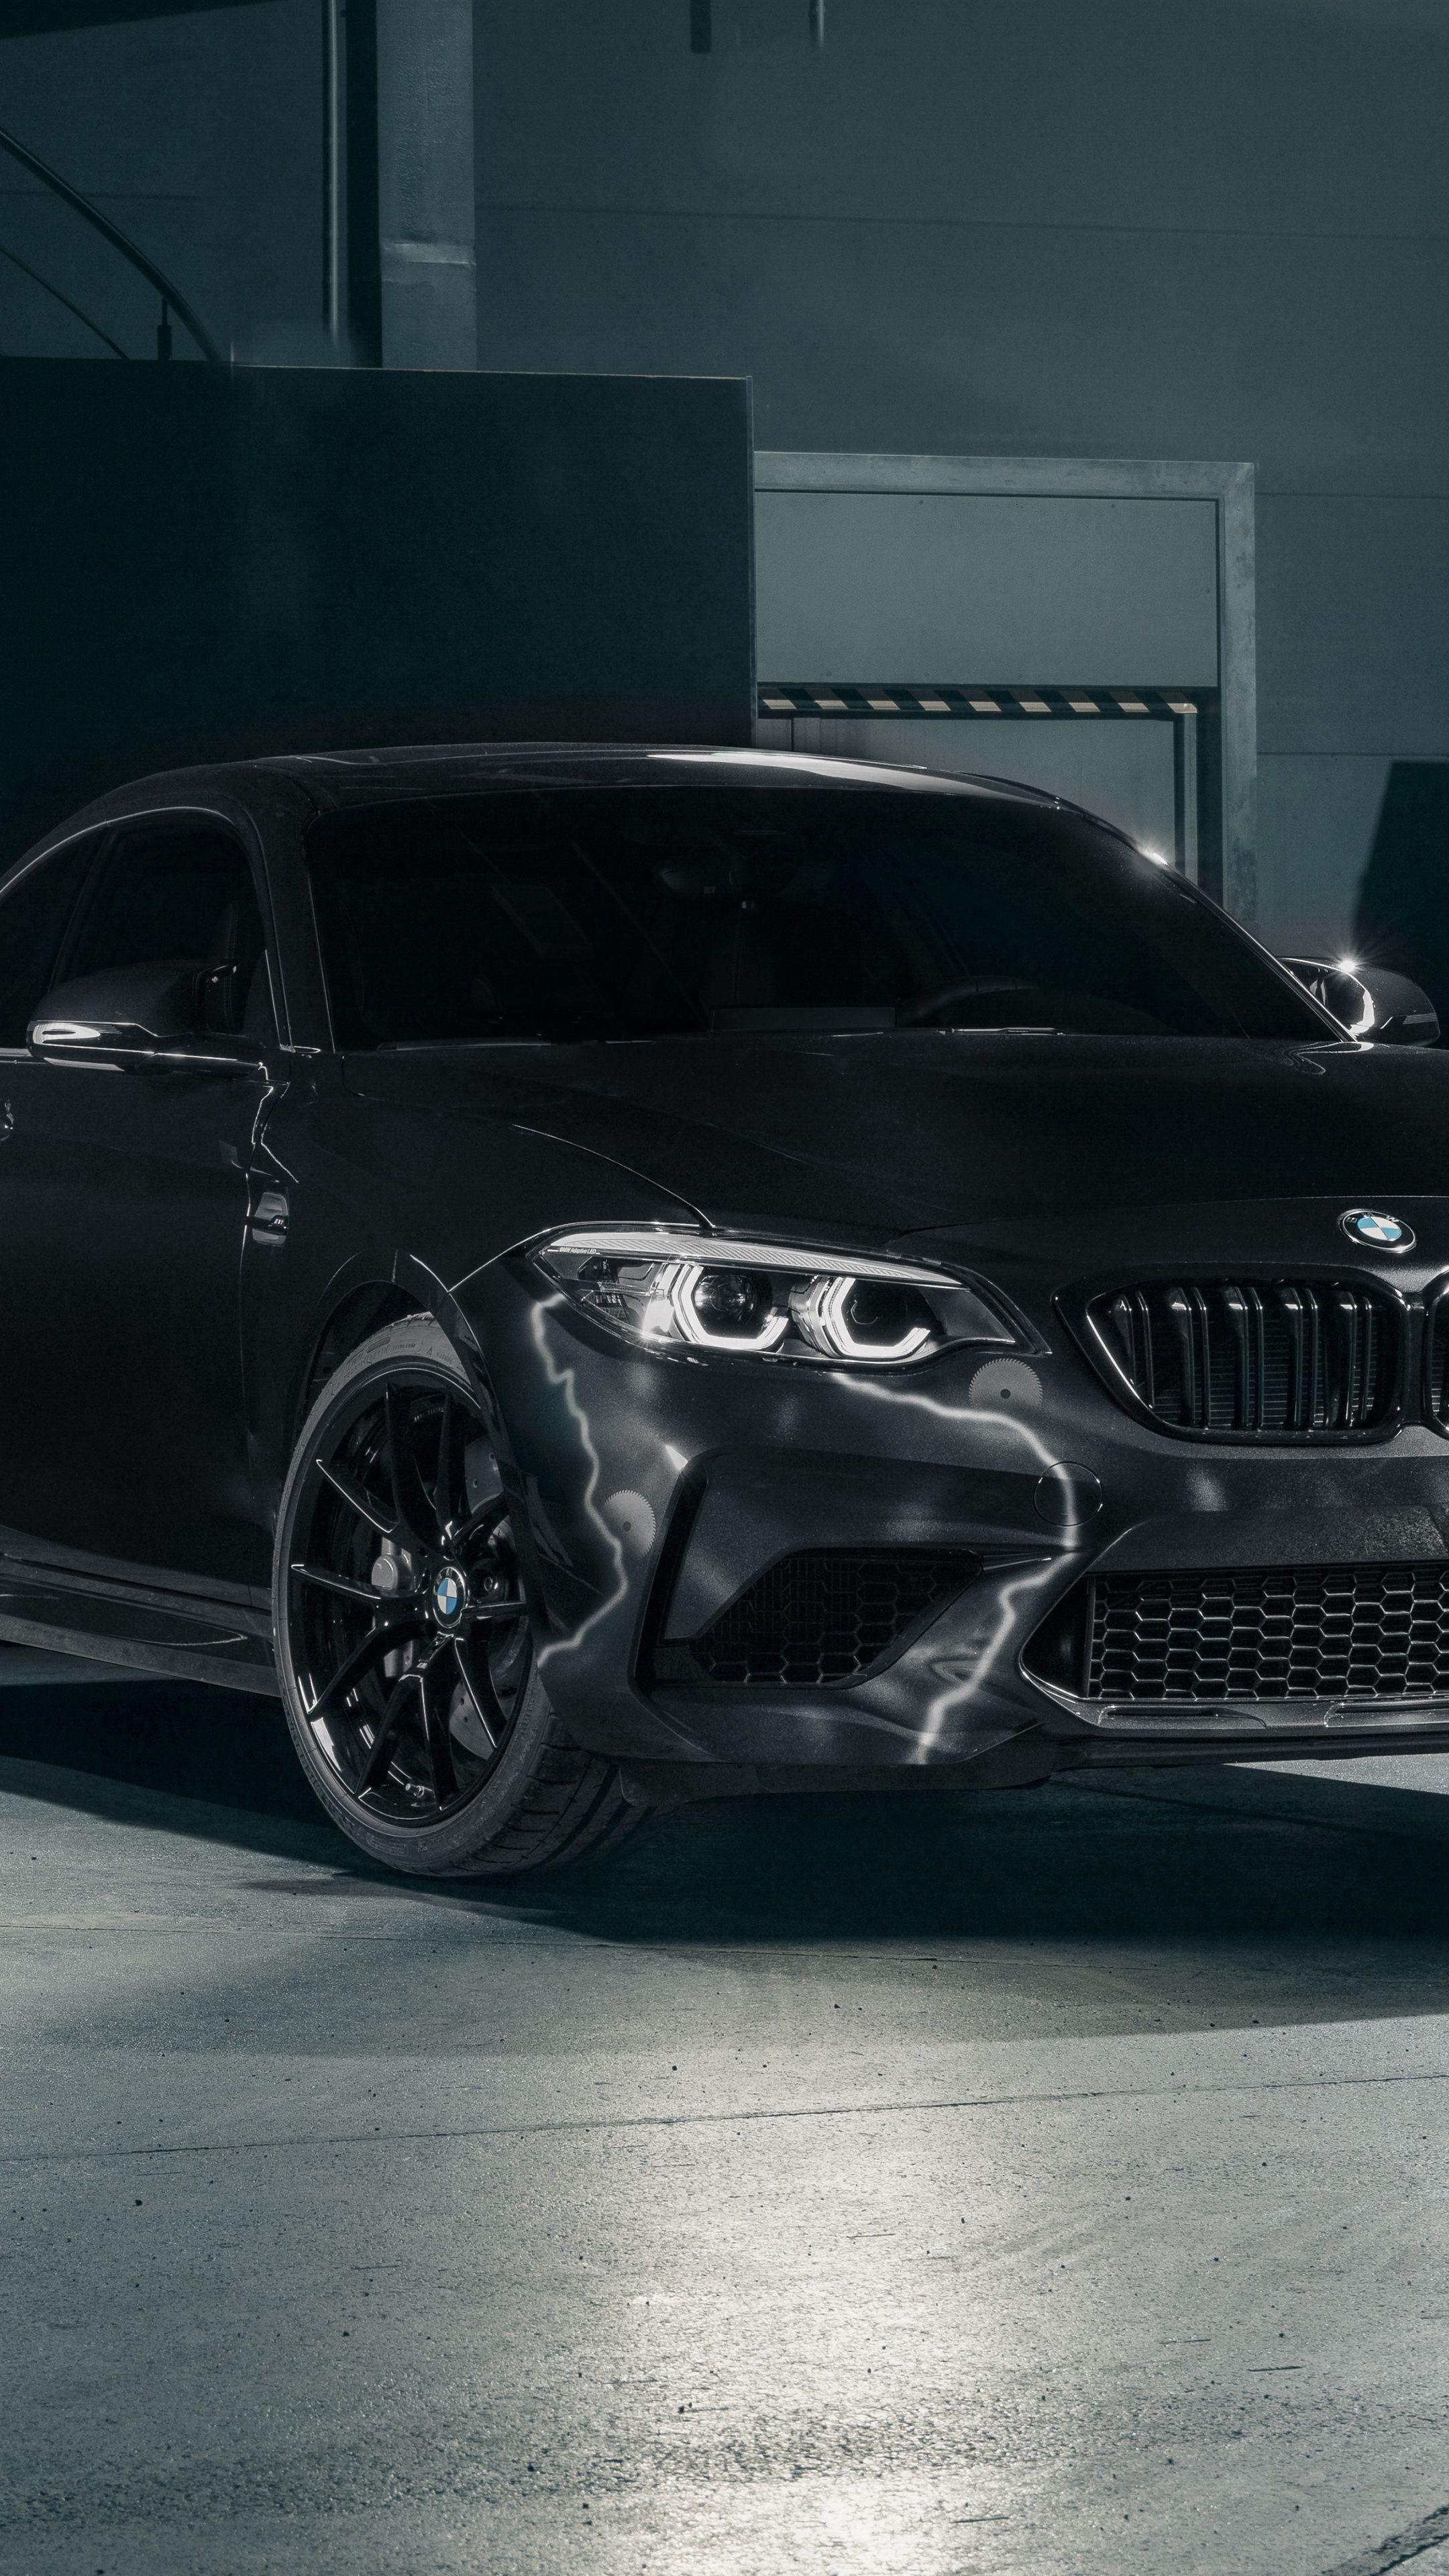 2160x3840 2020 Bmw M2 Black Car Wallpaper Bmw 2020 Bmw Bmw M2